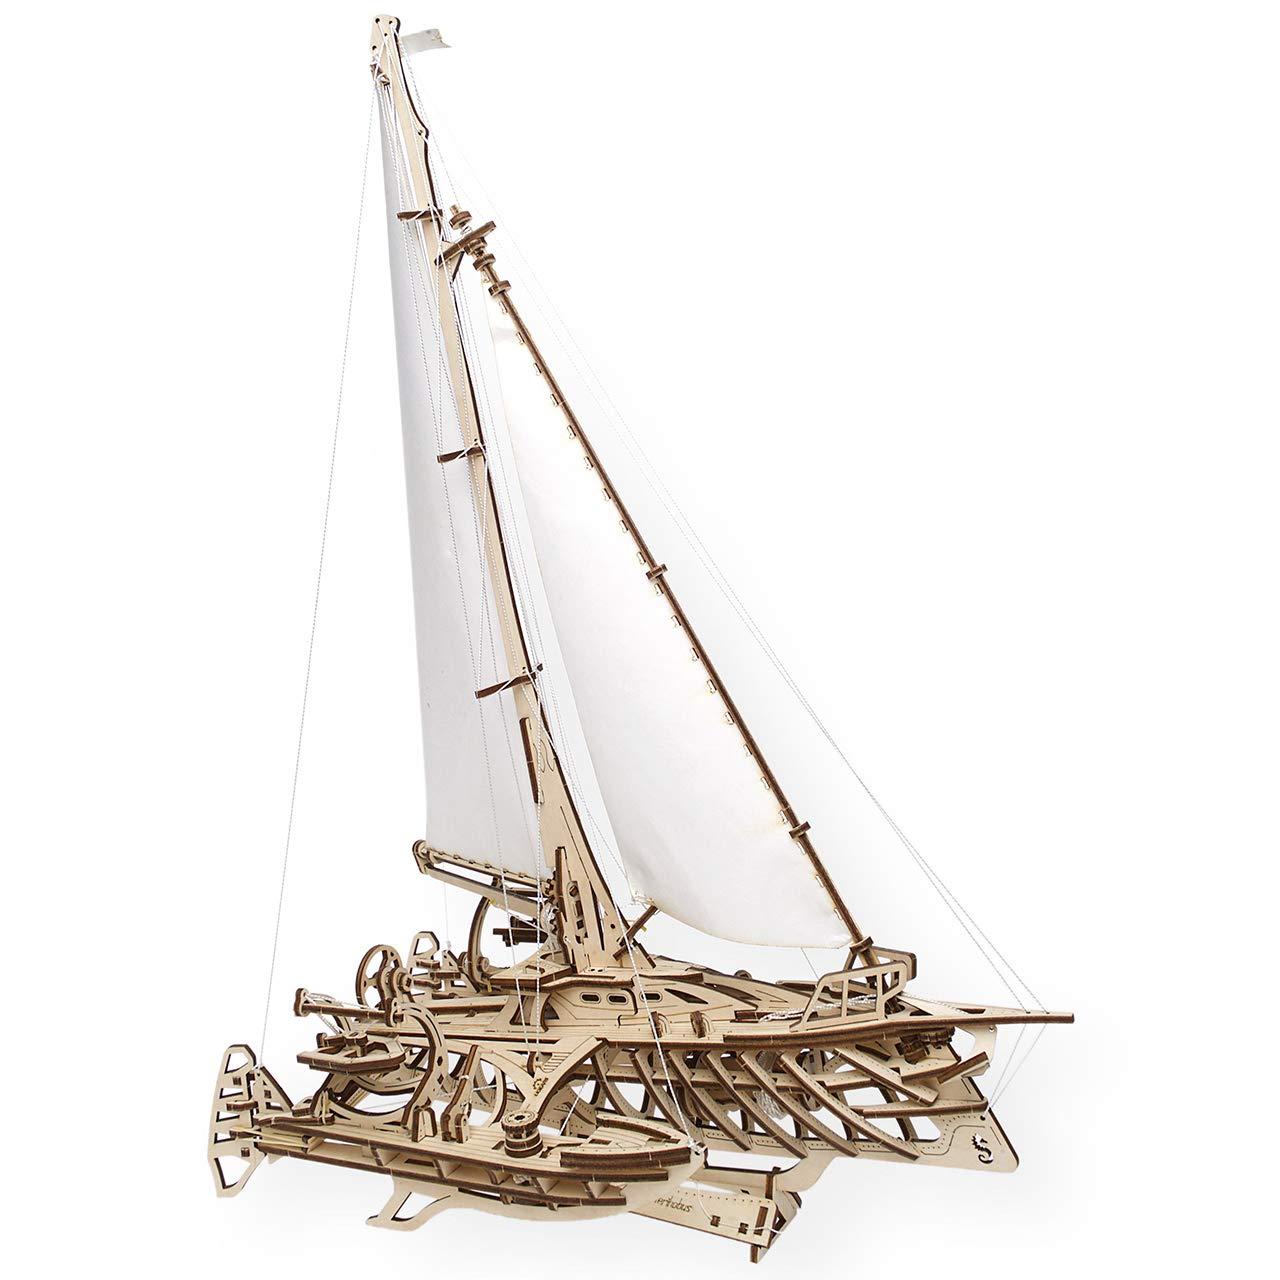 UGEARS TRIMARAN MERIHOBUS Wooden Model for Assembling 3D Brainteaser Adults and Teens Craft Kit Gift